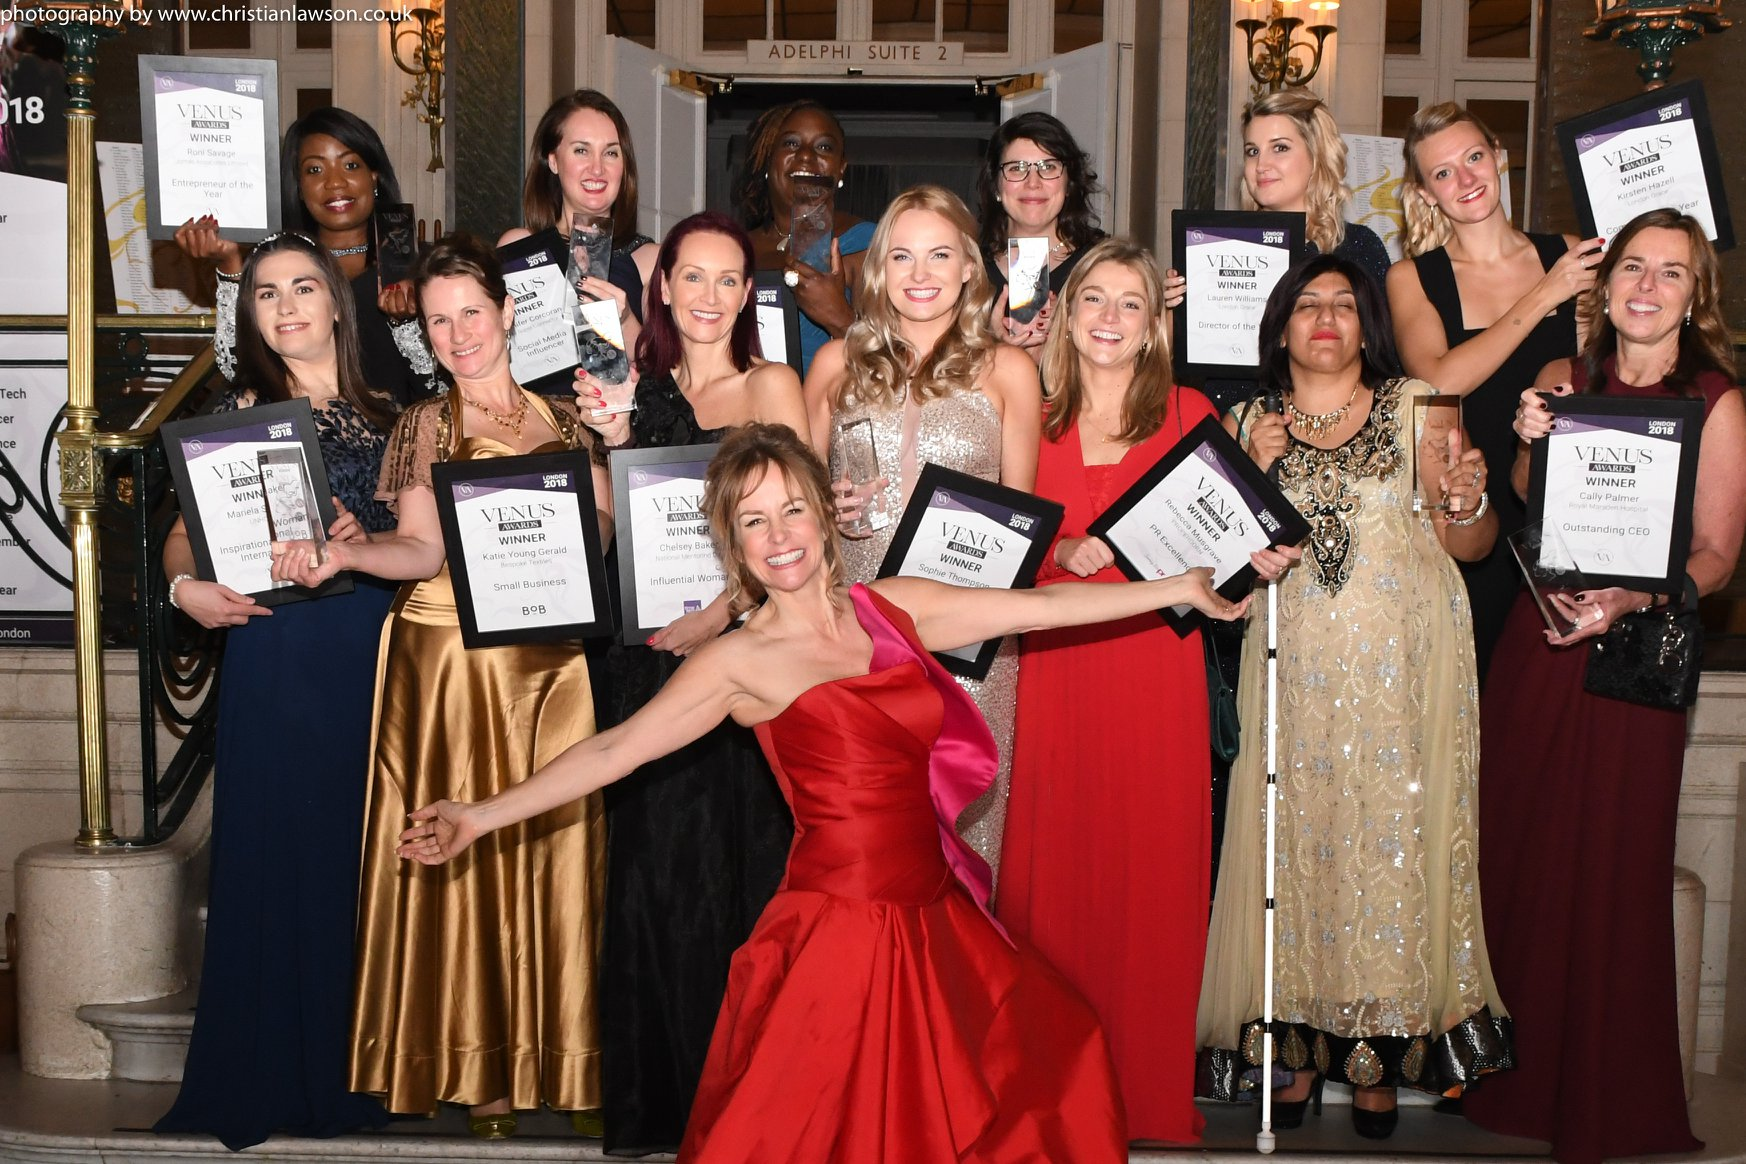 Venus Awards Winners London 2018